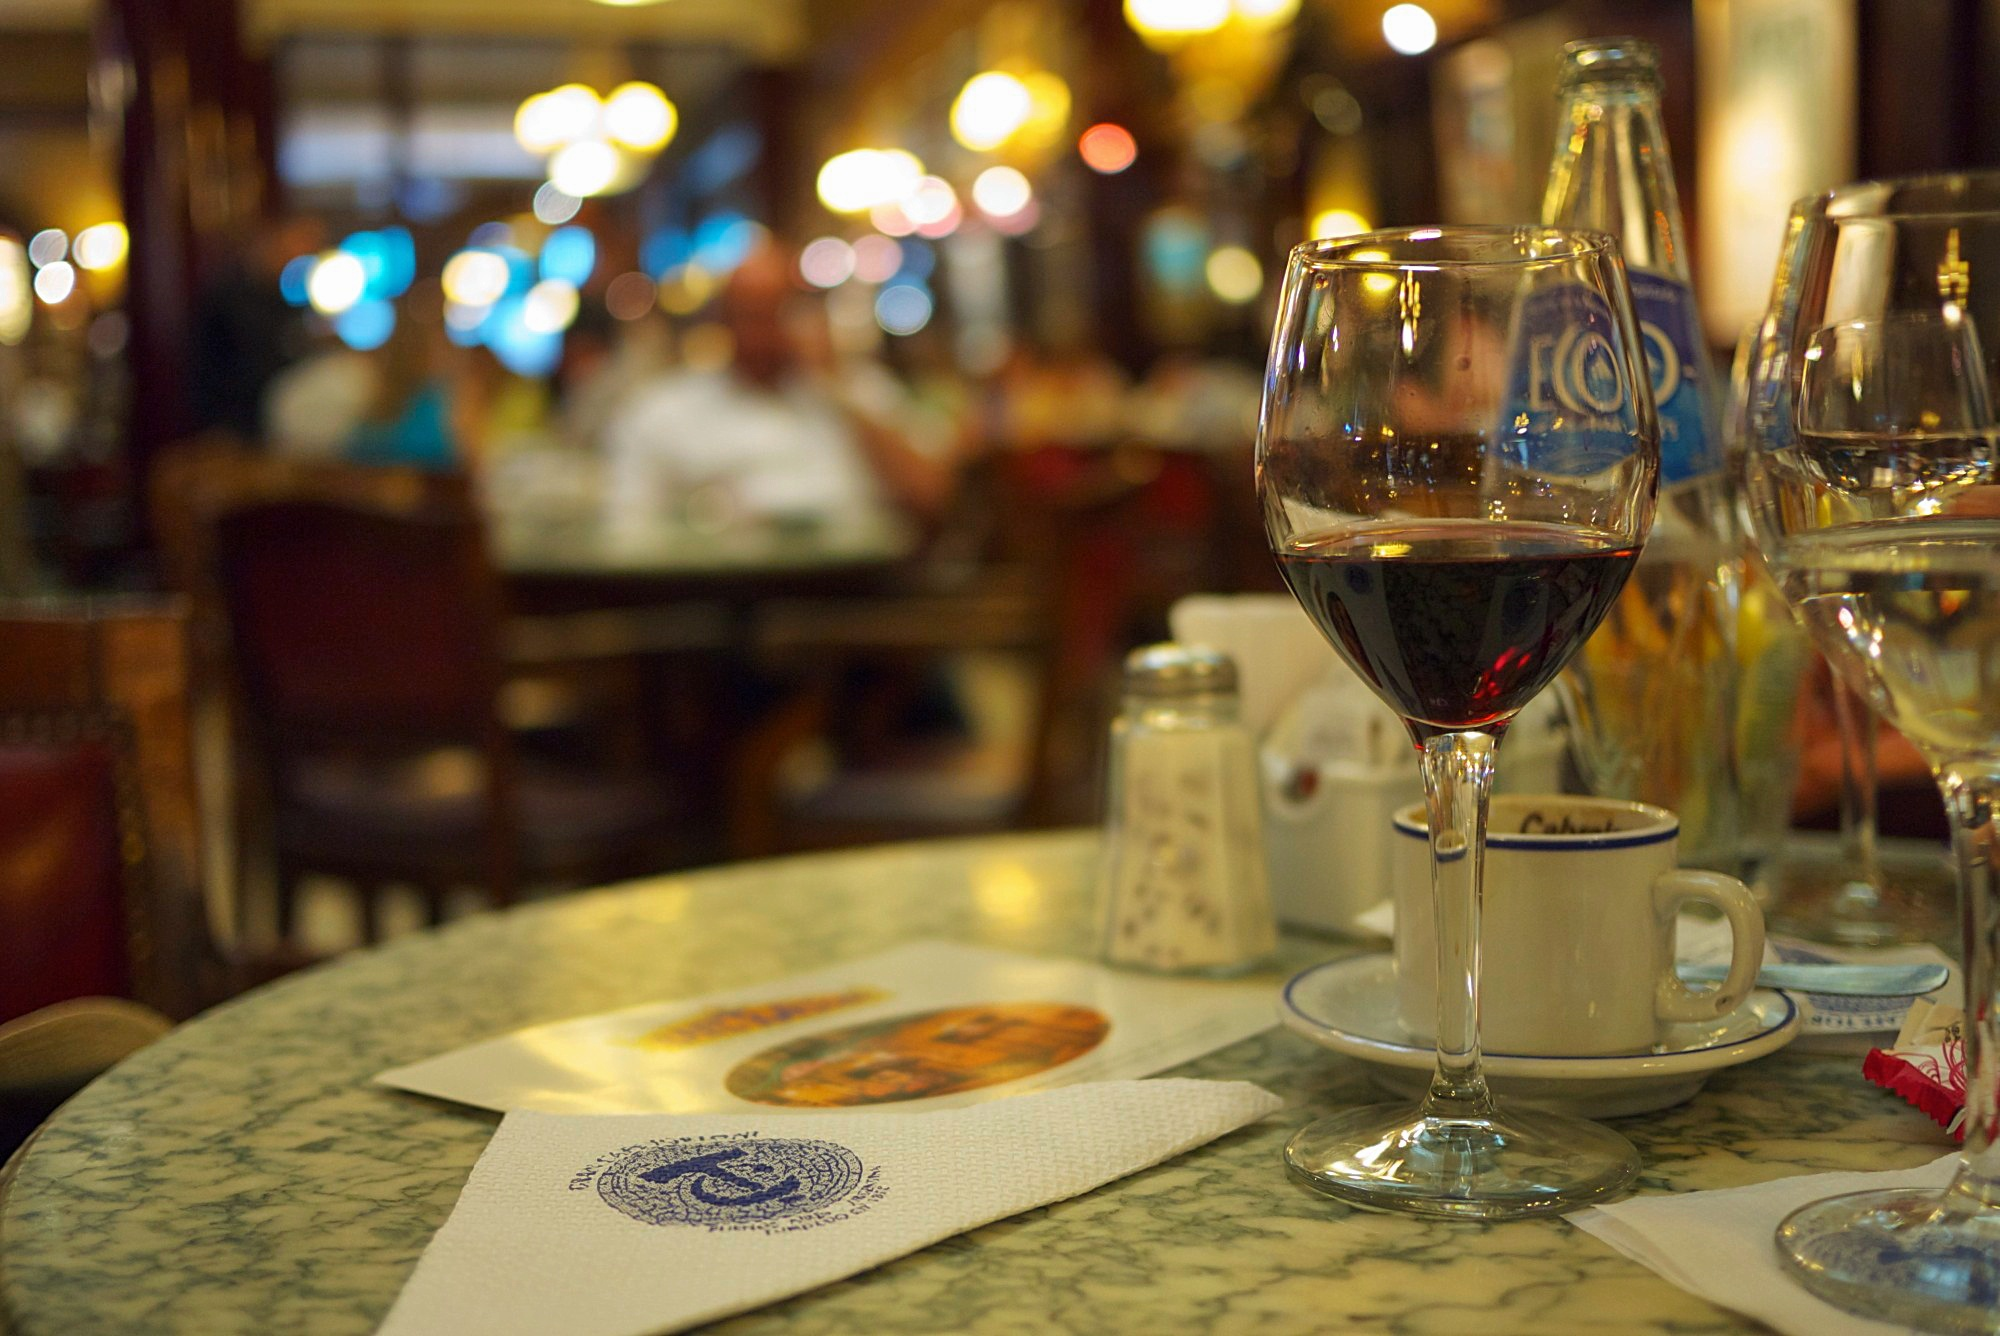 Cafe Tortoni, Avenida de Mayo, Buenos Aires